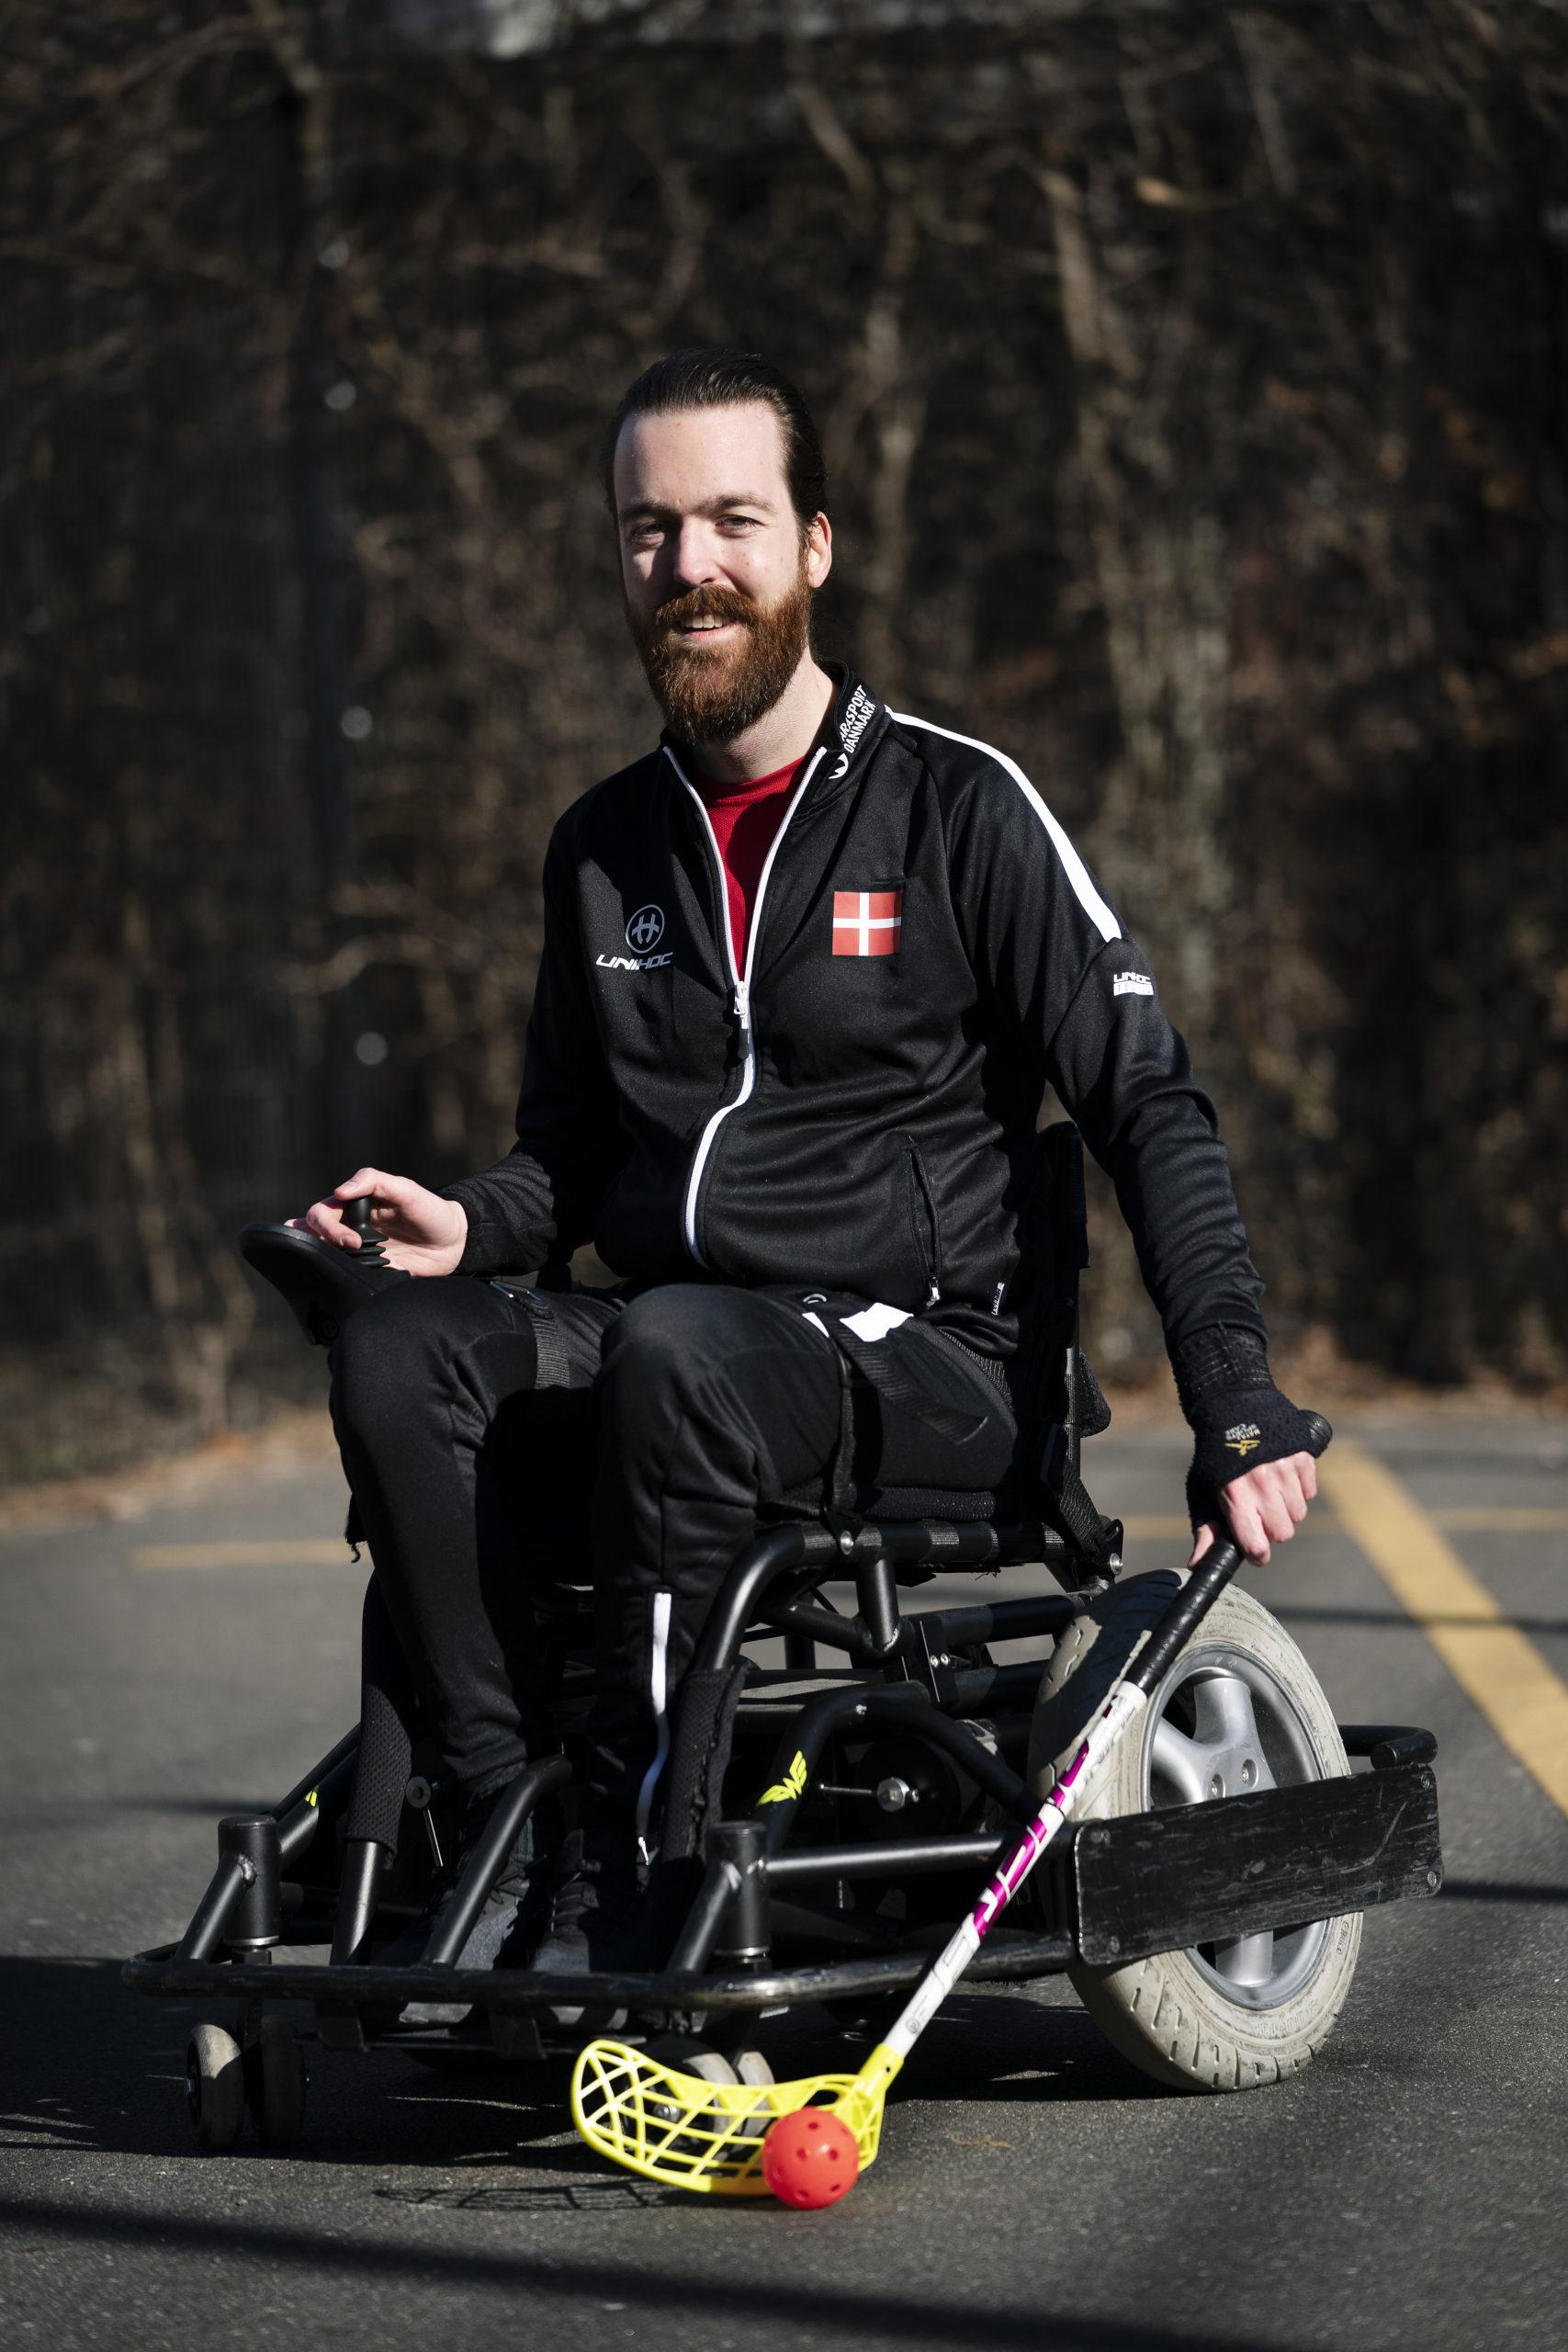 30-årige Anders Berenth er han kåret til verdens bedste inden for sin sport, powerchair floorball. Han har vundet sølvmedalje med landsholdet ved VM i 2018, og har modtaget KulturministerensParasportspris. Han er født med muskelsvinddiagnosen Kongenit myopati.